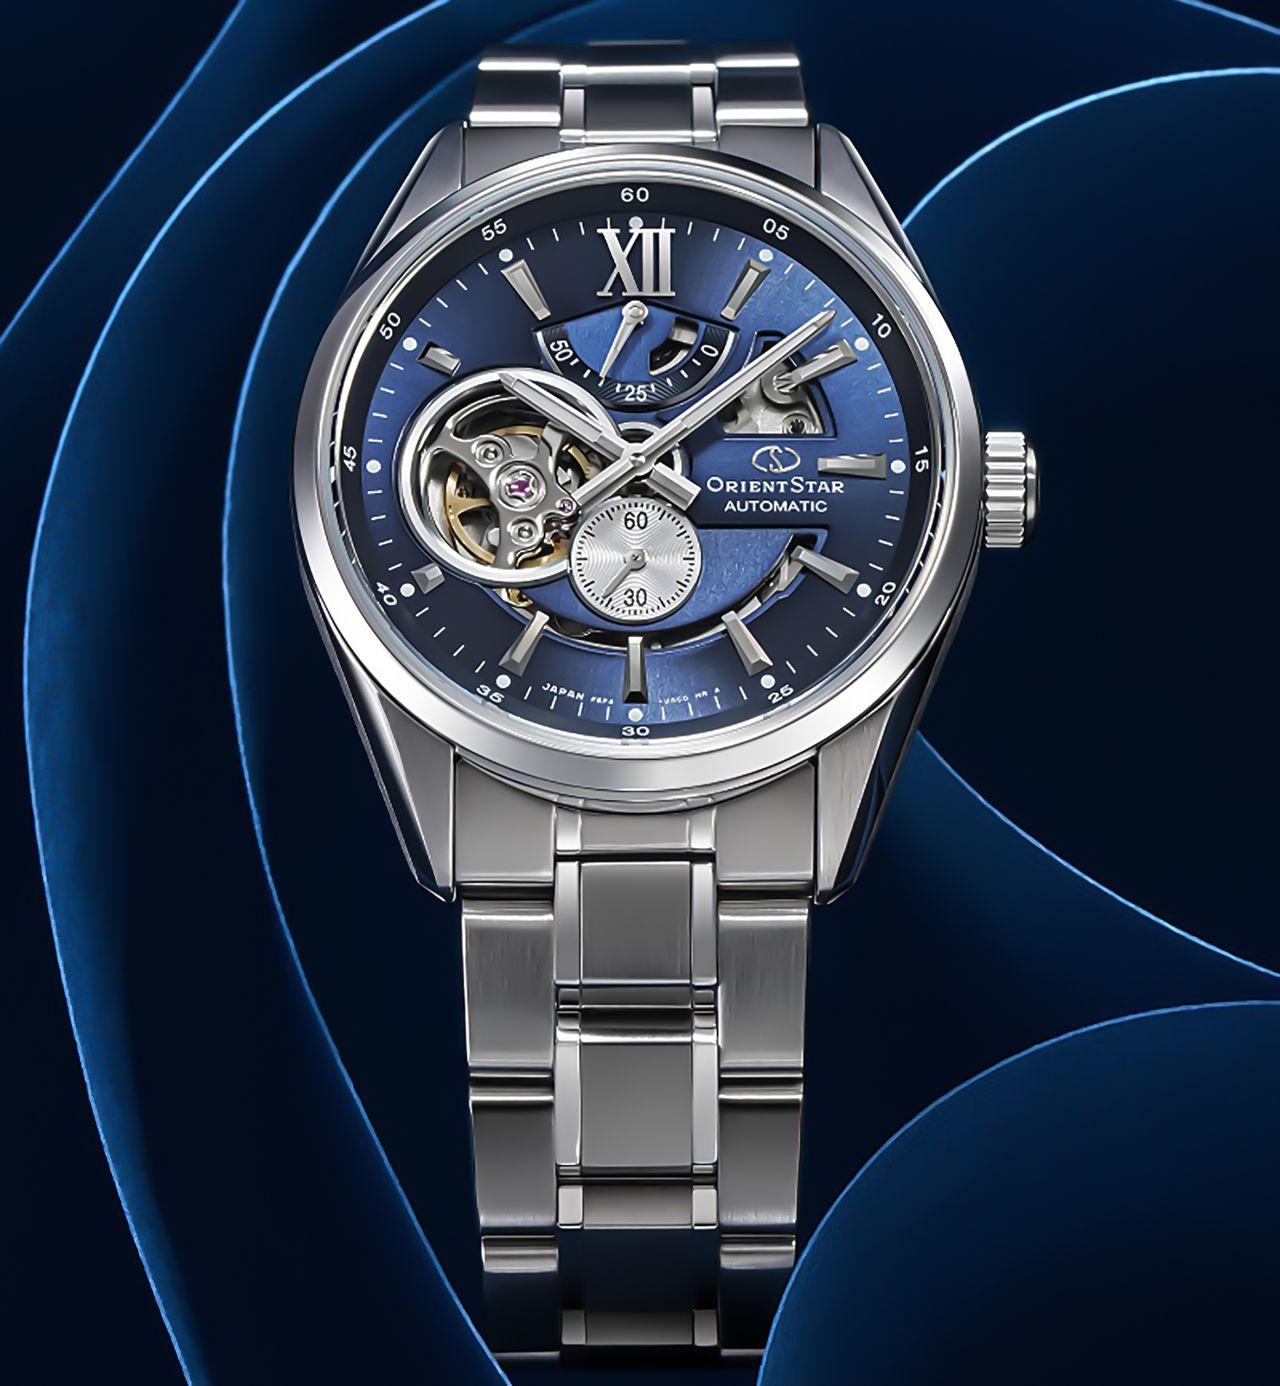 kapudrog - ORIENT STAR Mechanical Contemporary Watch, nyitott szívvel